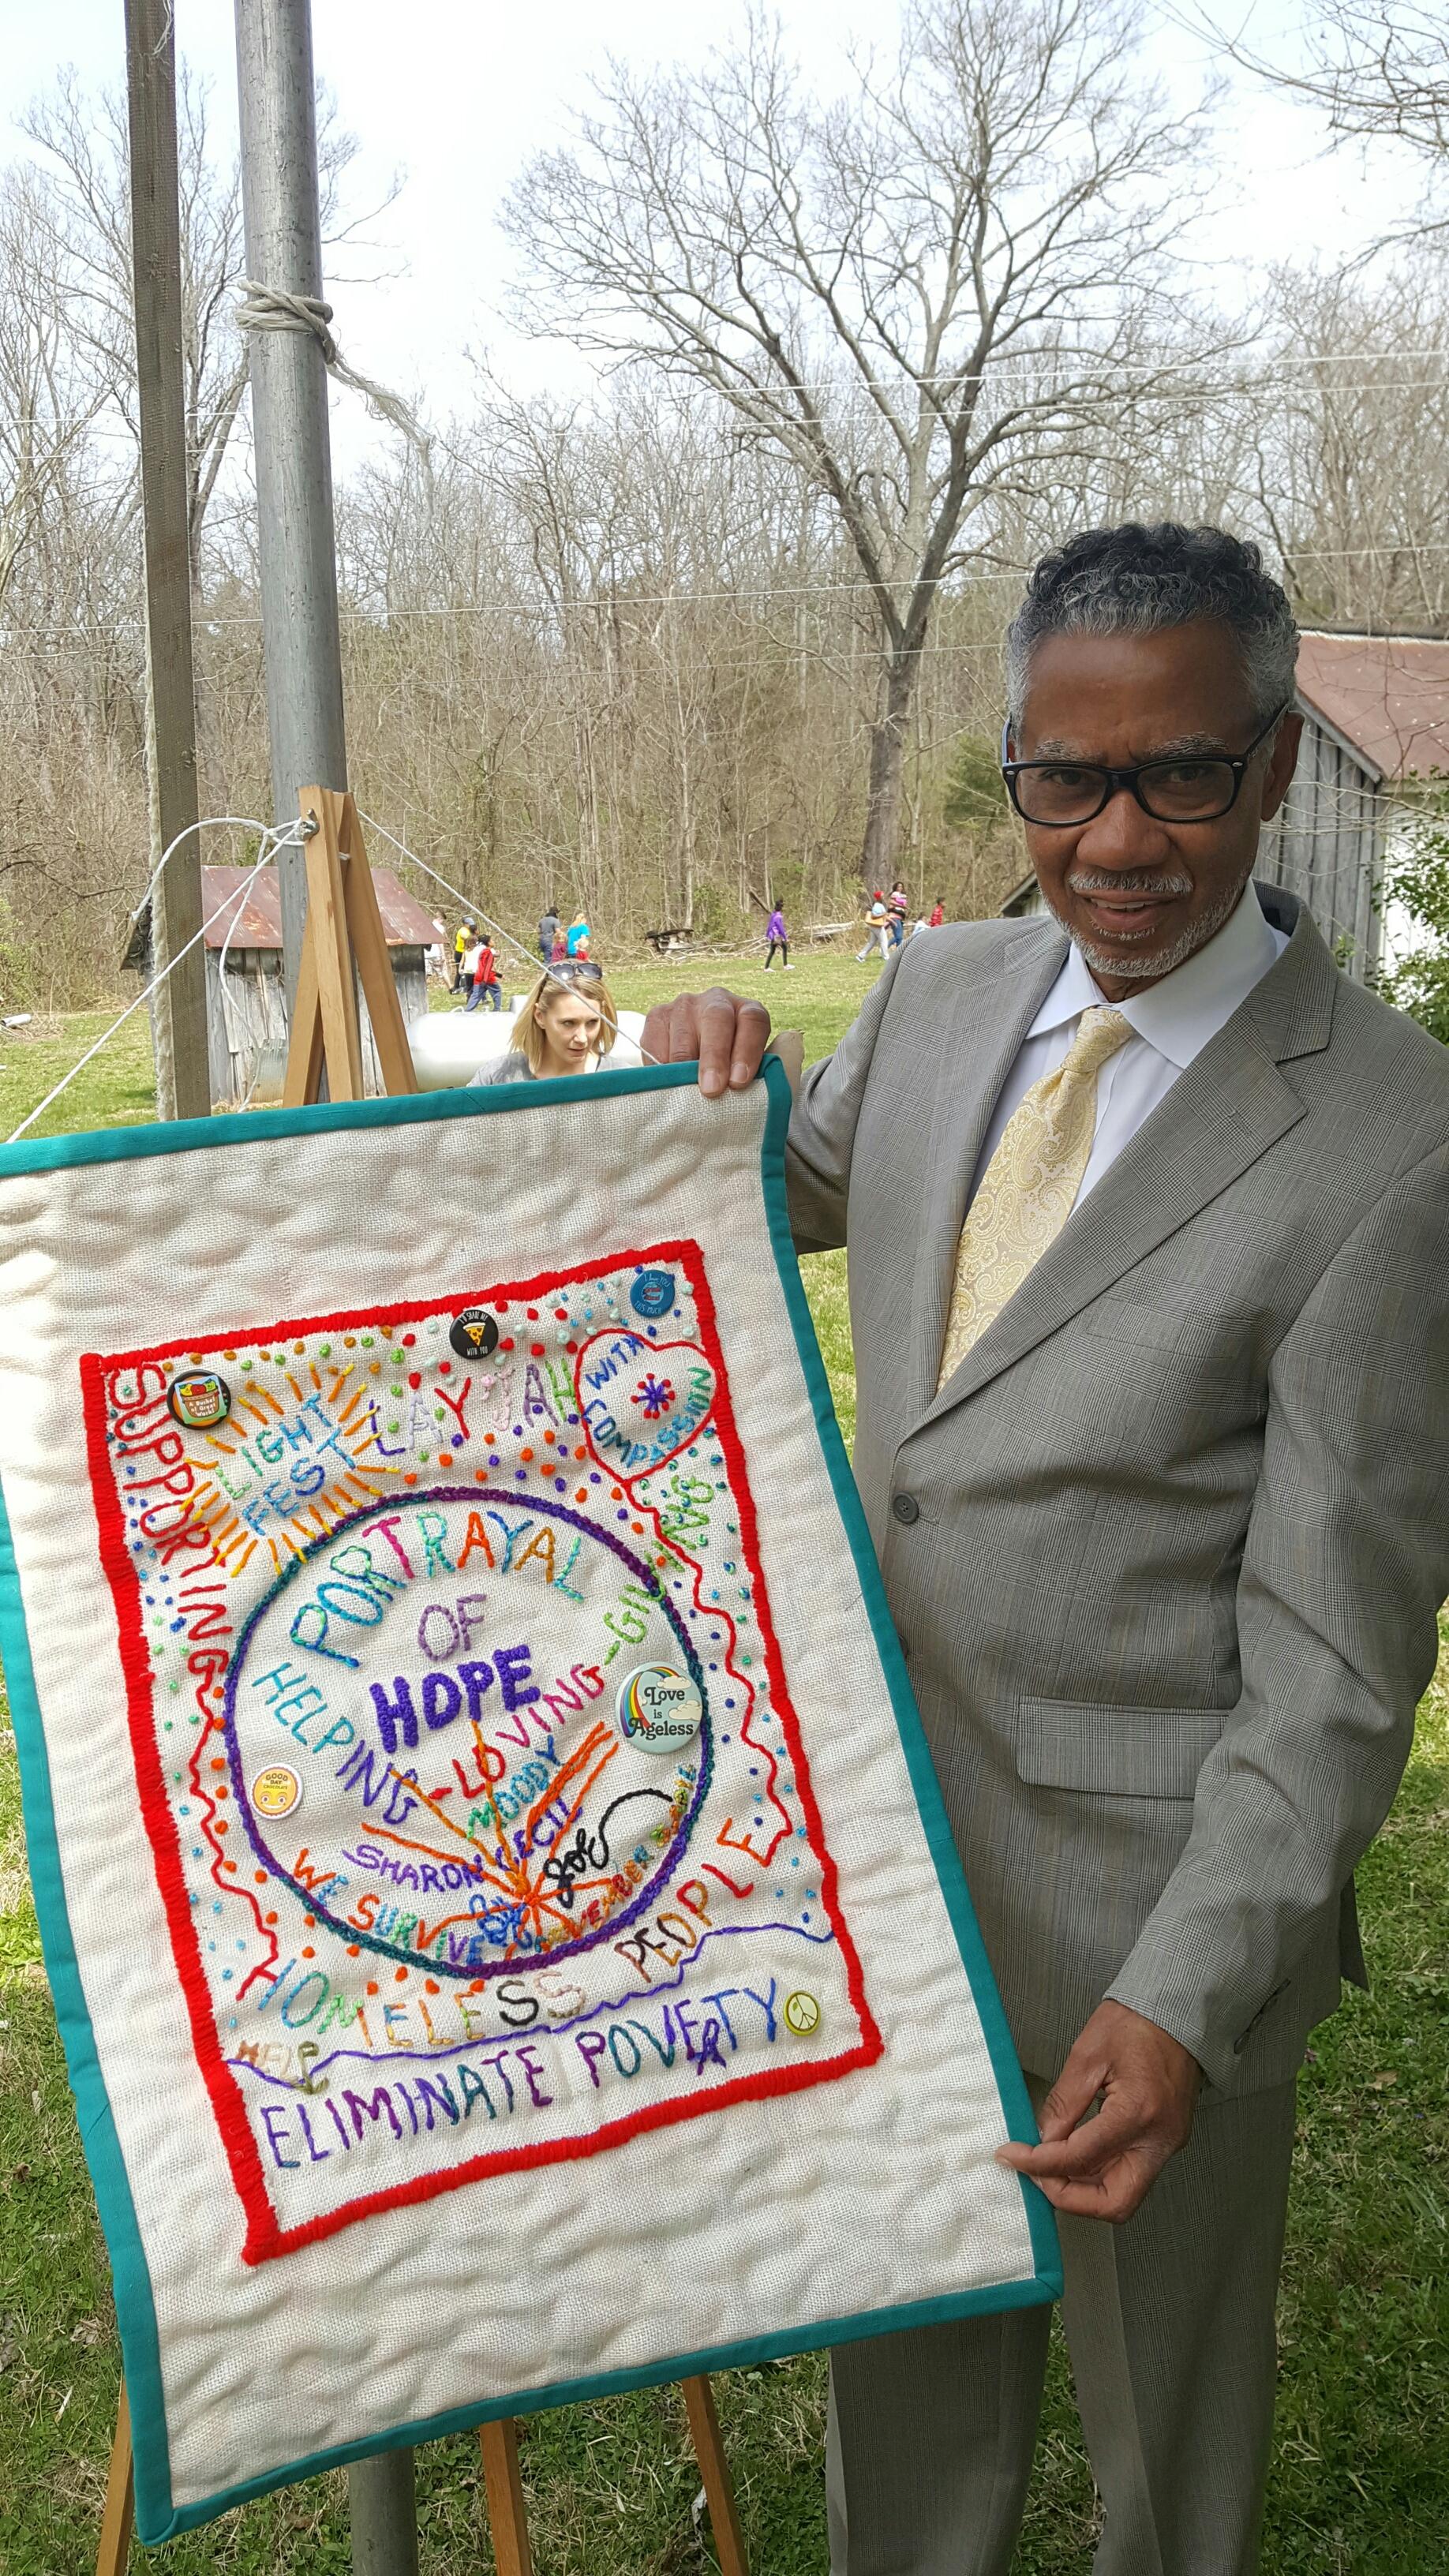 Sunshine Joe with LightFEST 2016 Tapestry